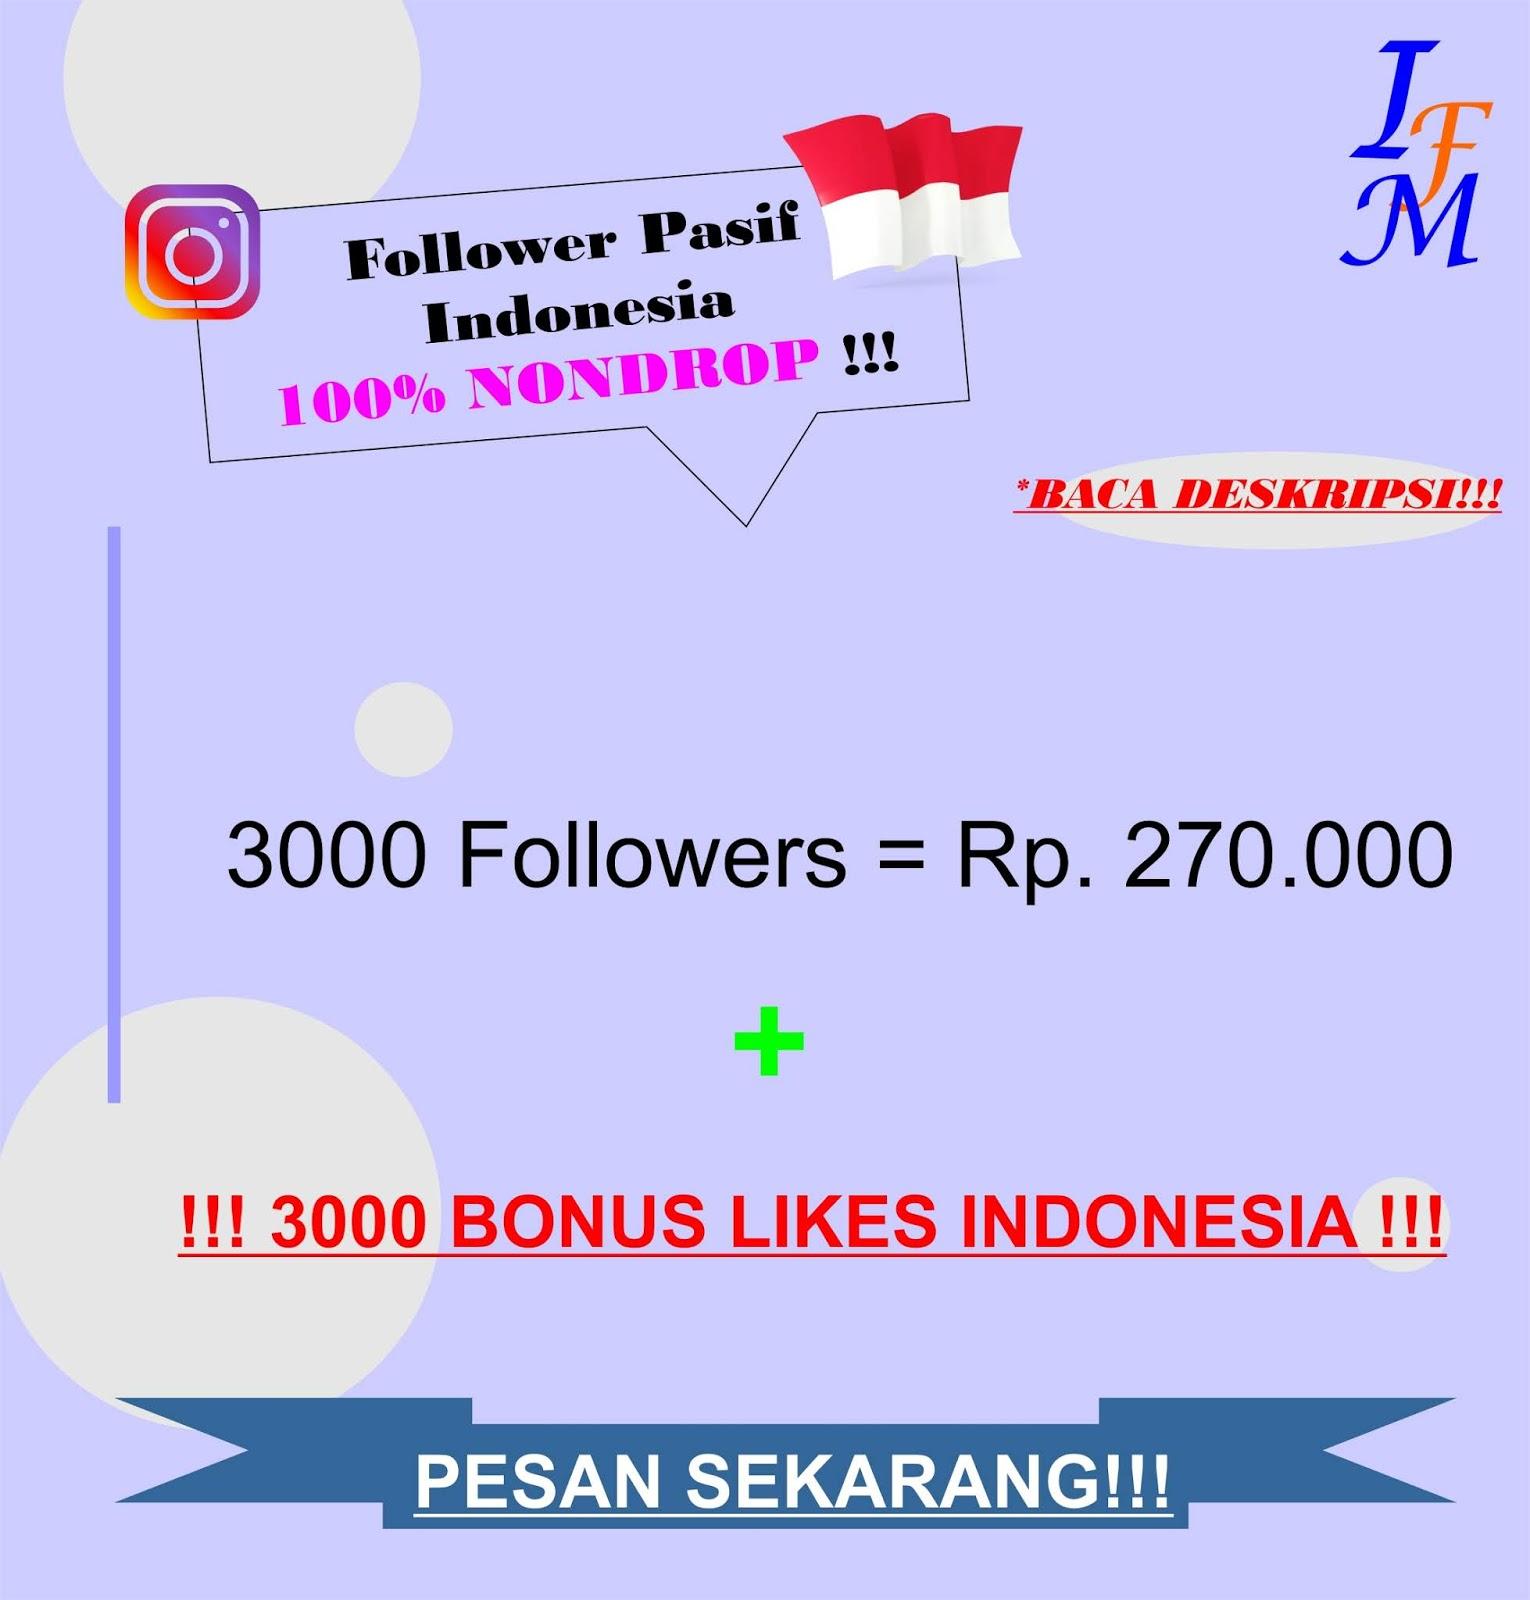 Jasa Tambah 3000 Follower Akun Instagram Pasif Original Indonesia 100% NONDROP Murah